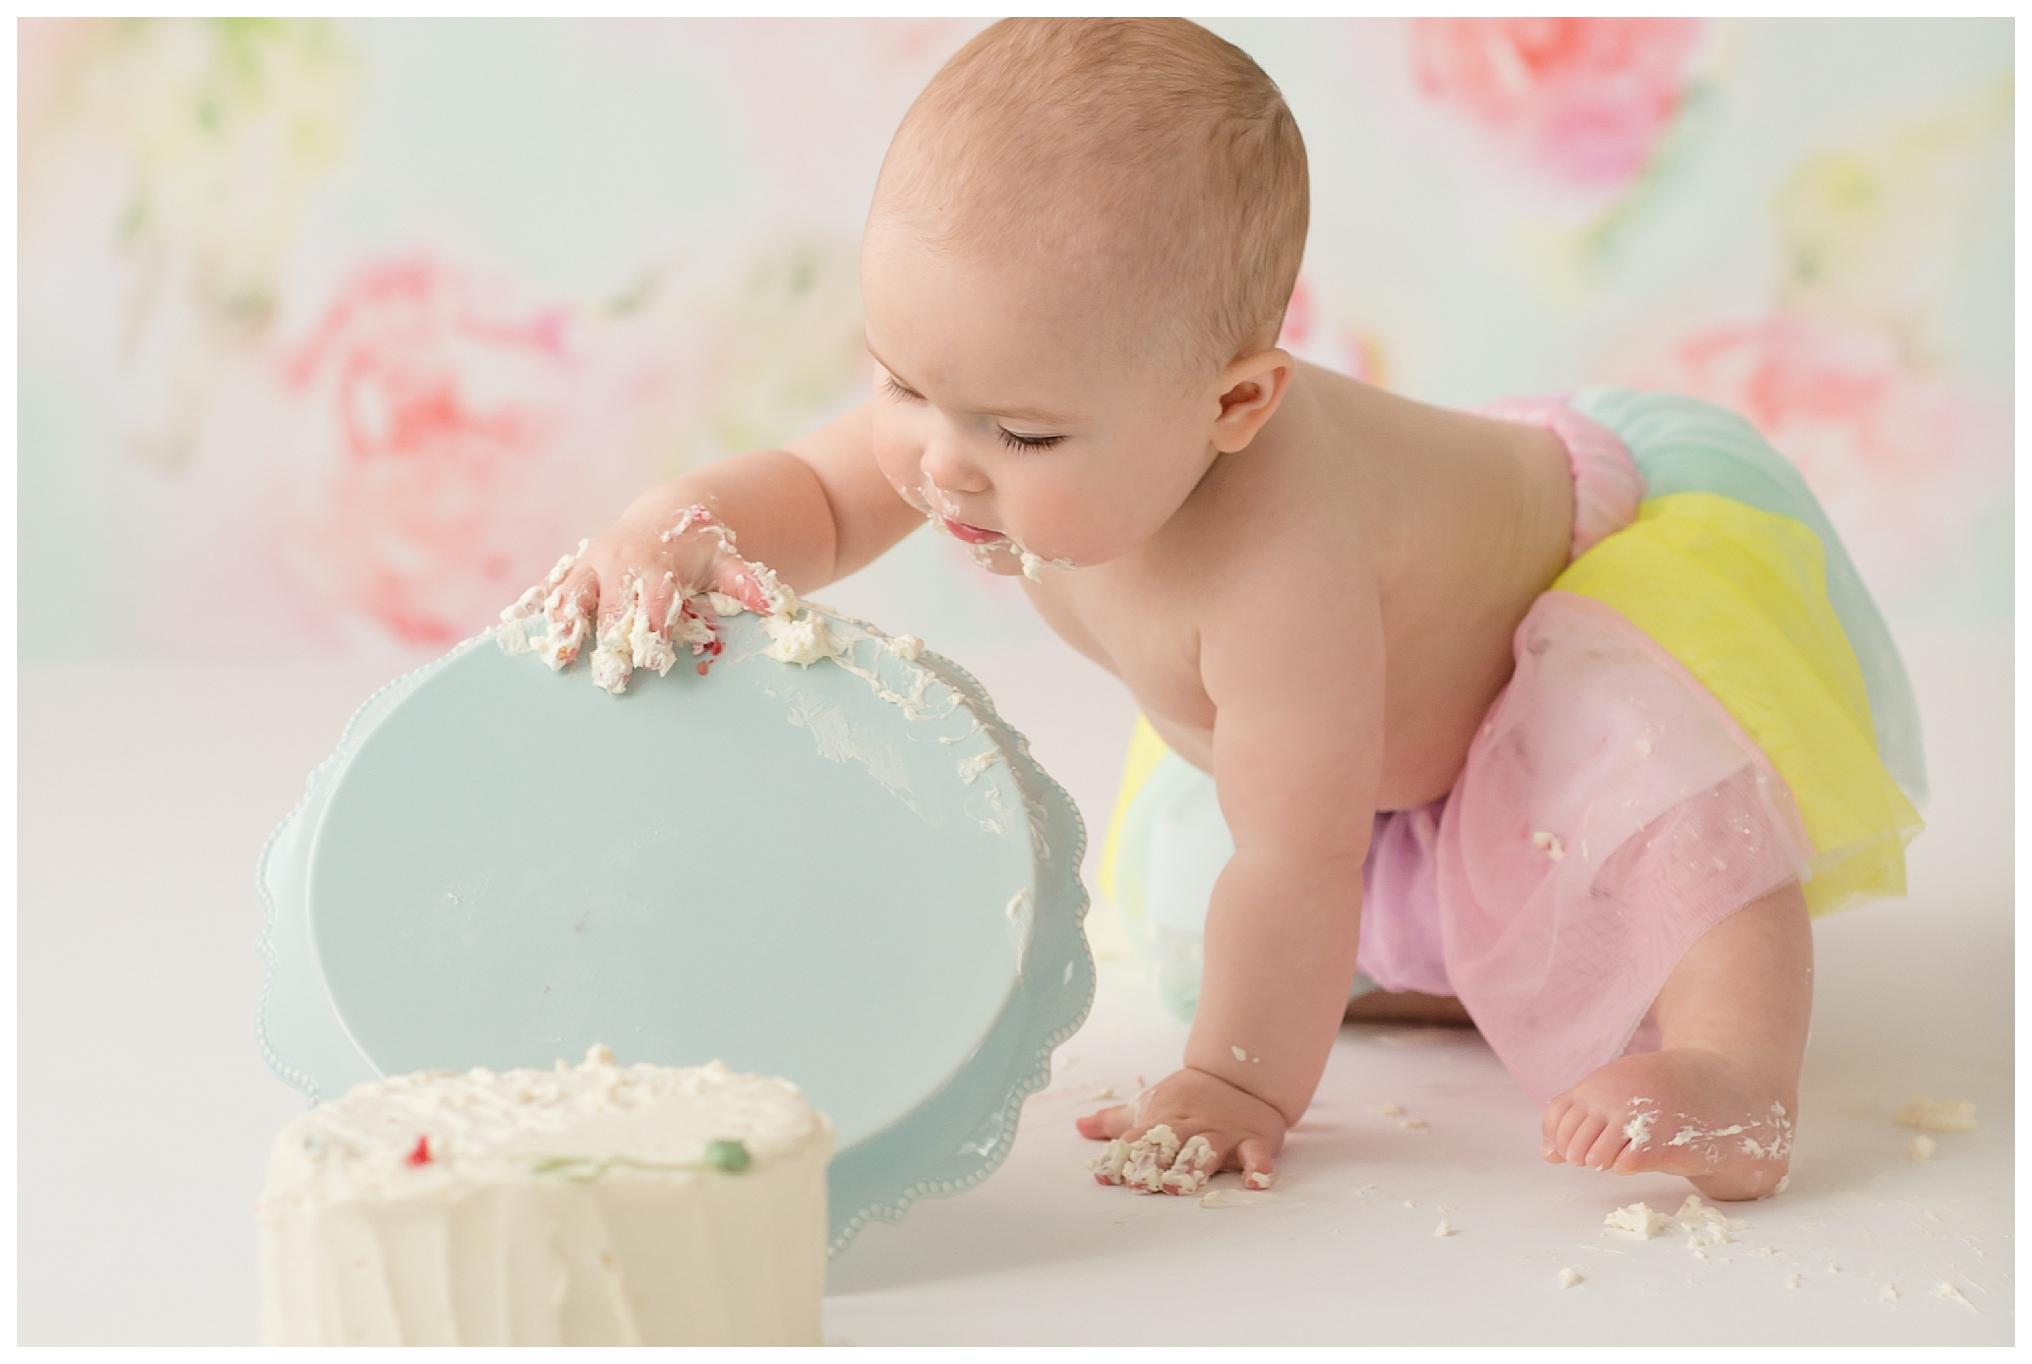 Maine-baby-photographer-sweet-light-portraits241.jpg